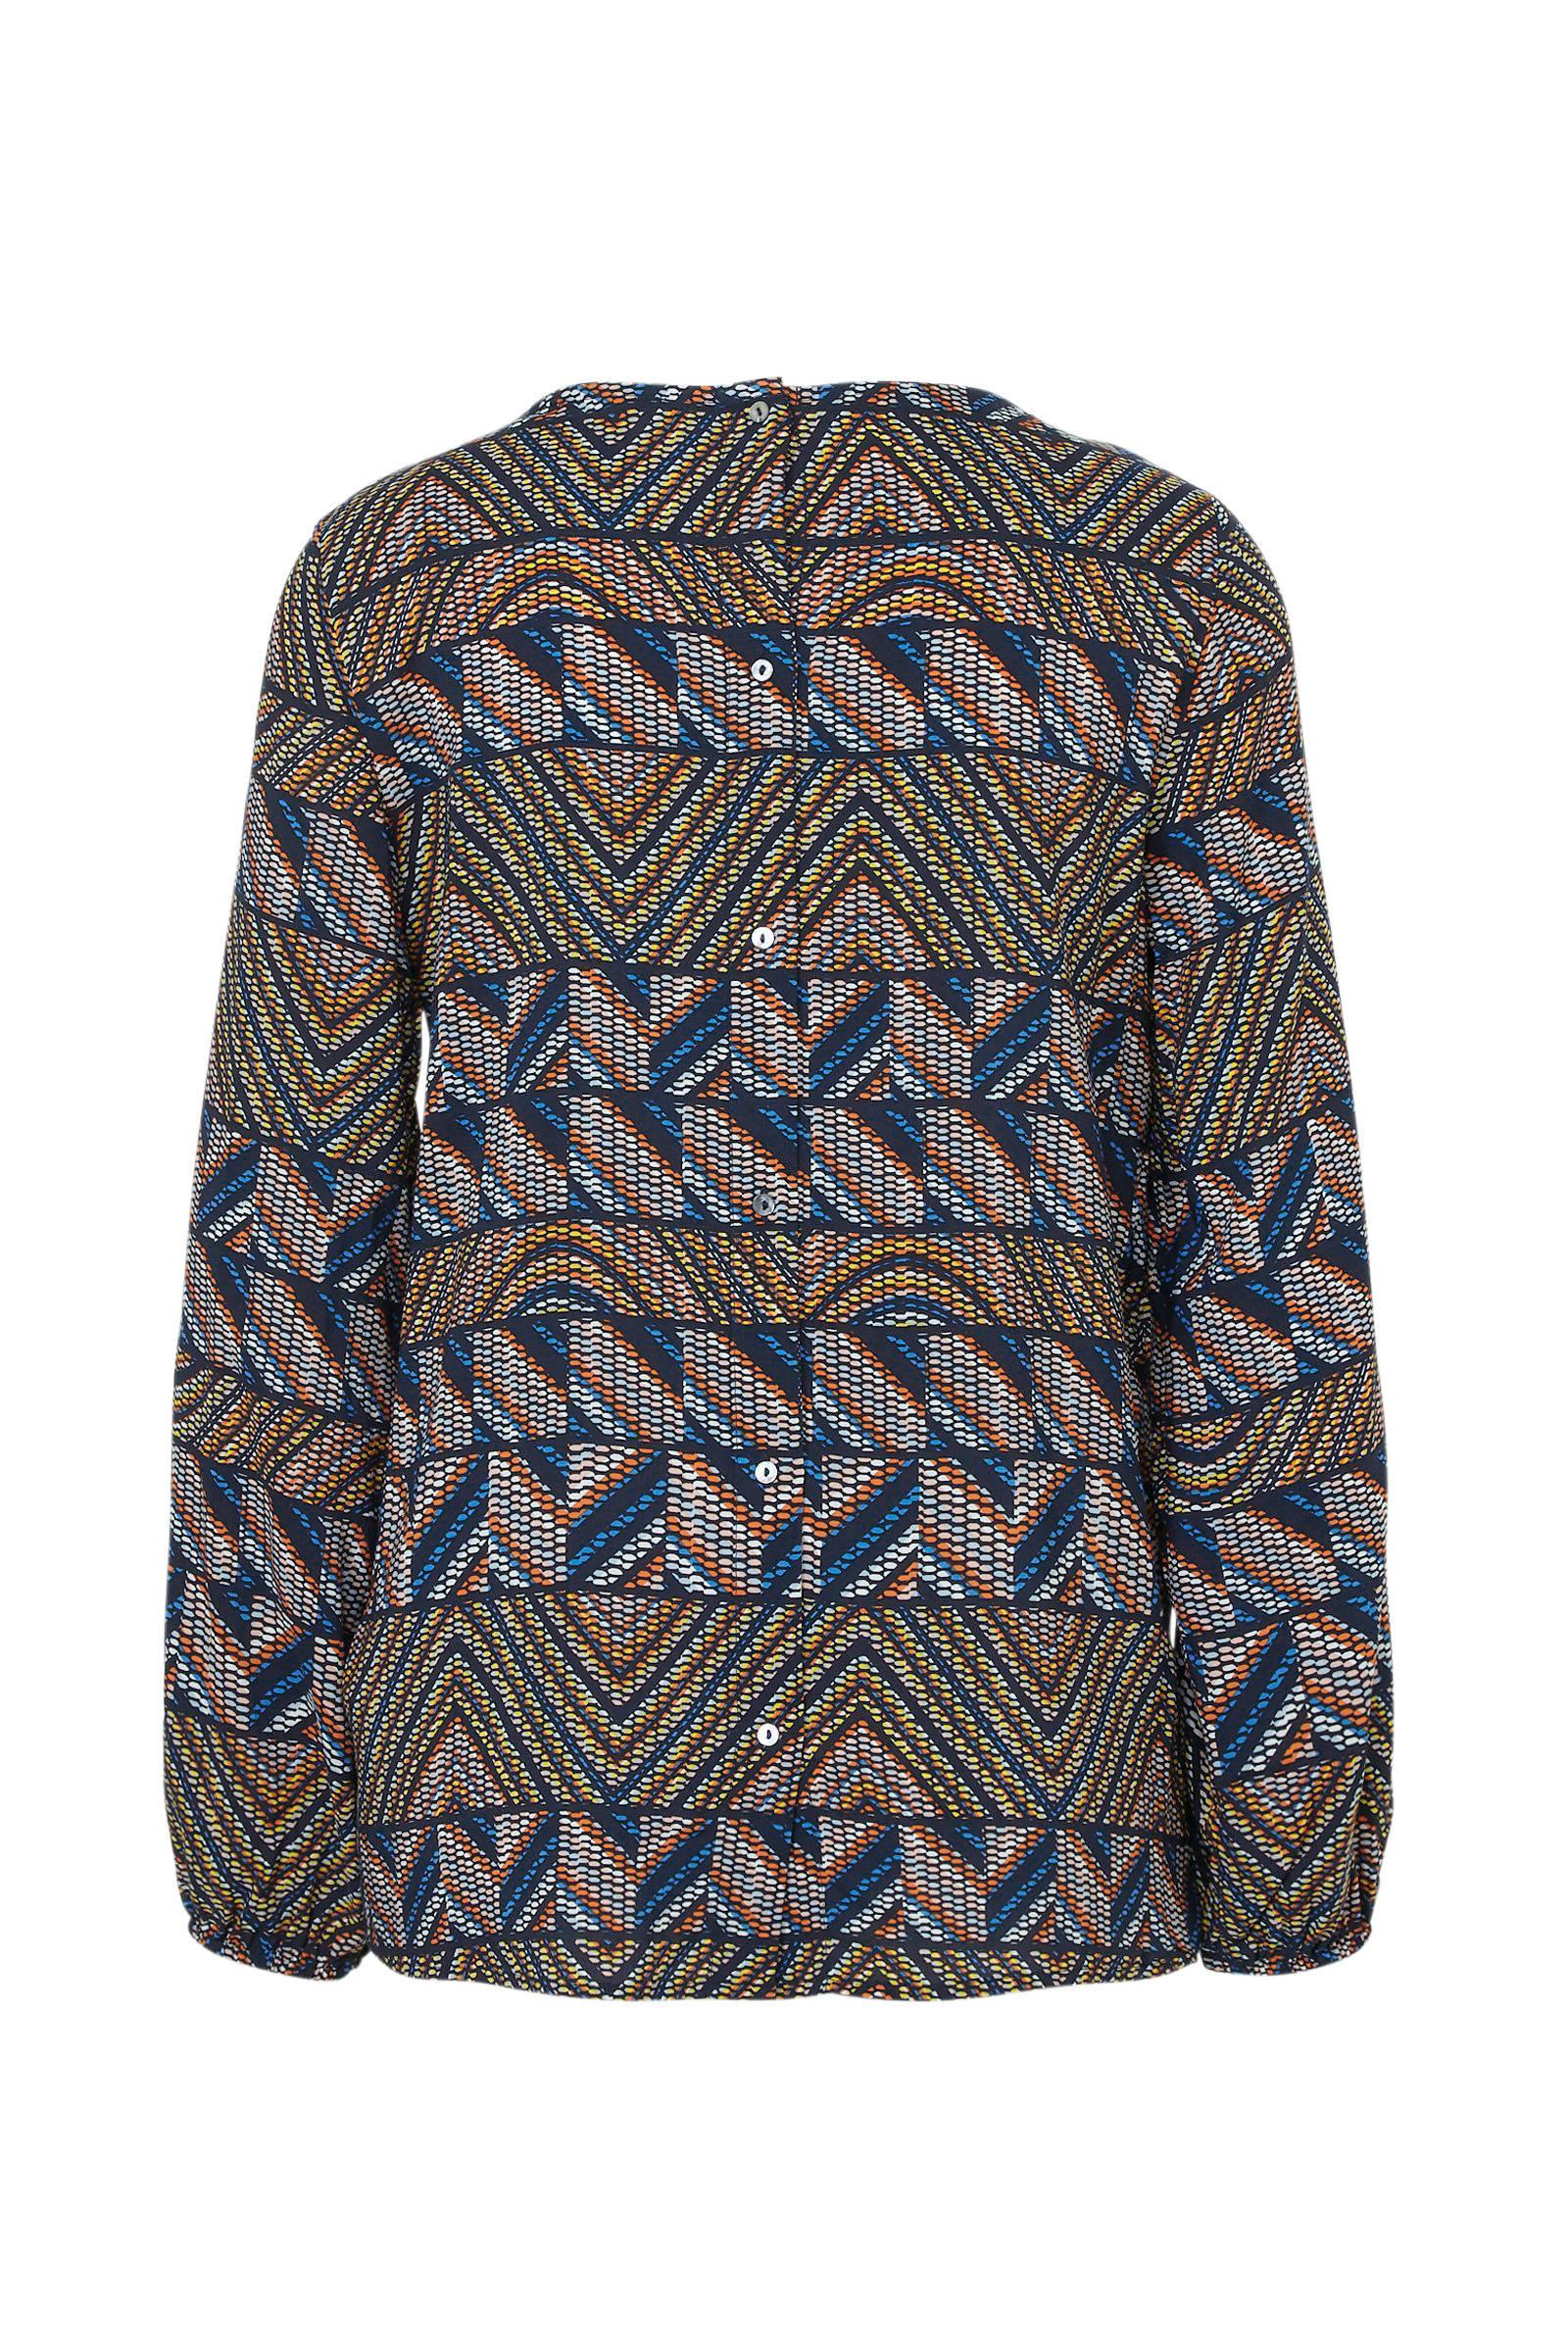 over edc met ESPRIT blouse Women print all 8URqq46p